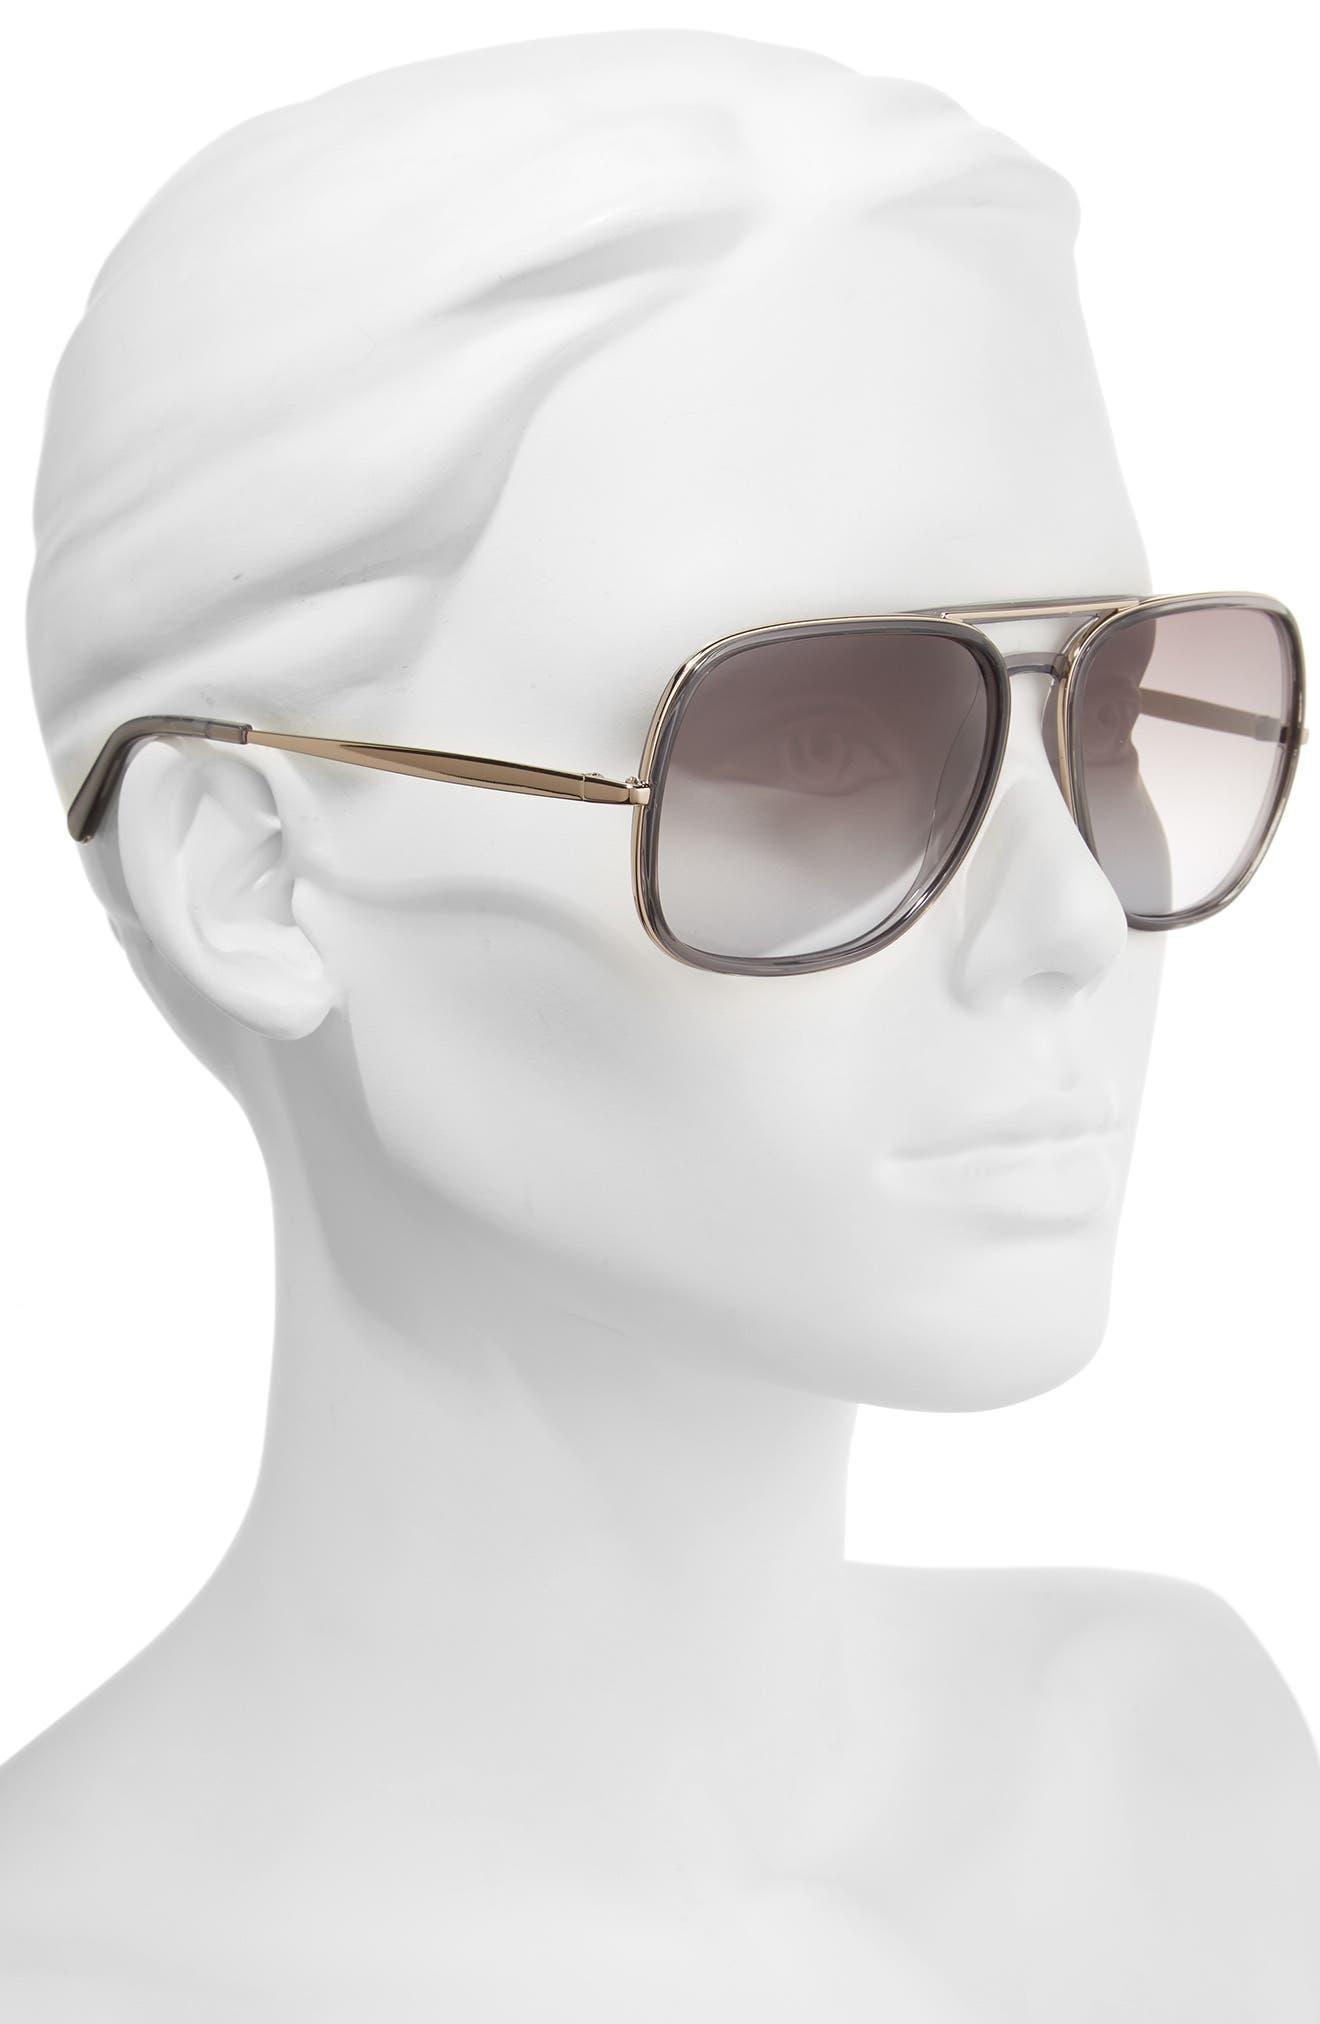 60mm Gradient Lens Navigator Sunglasses,                             Alternate thumbnail 2, color,                             020